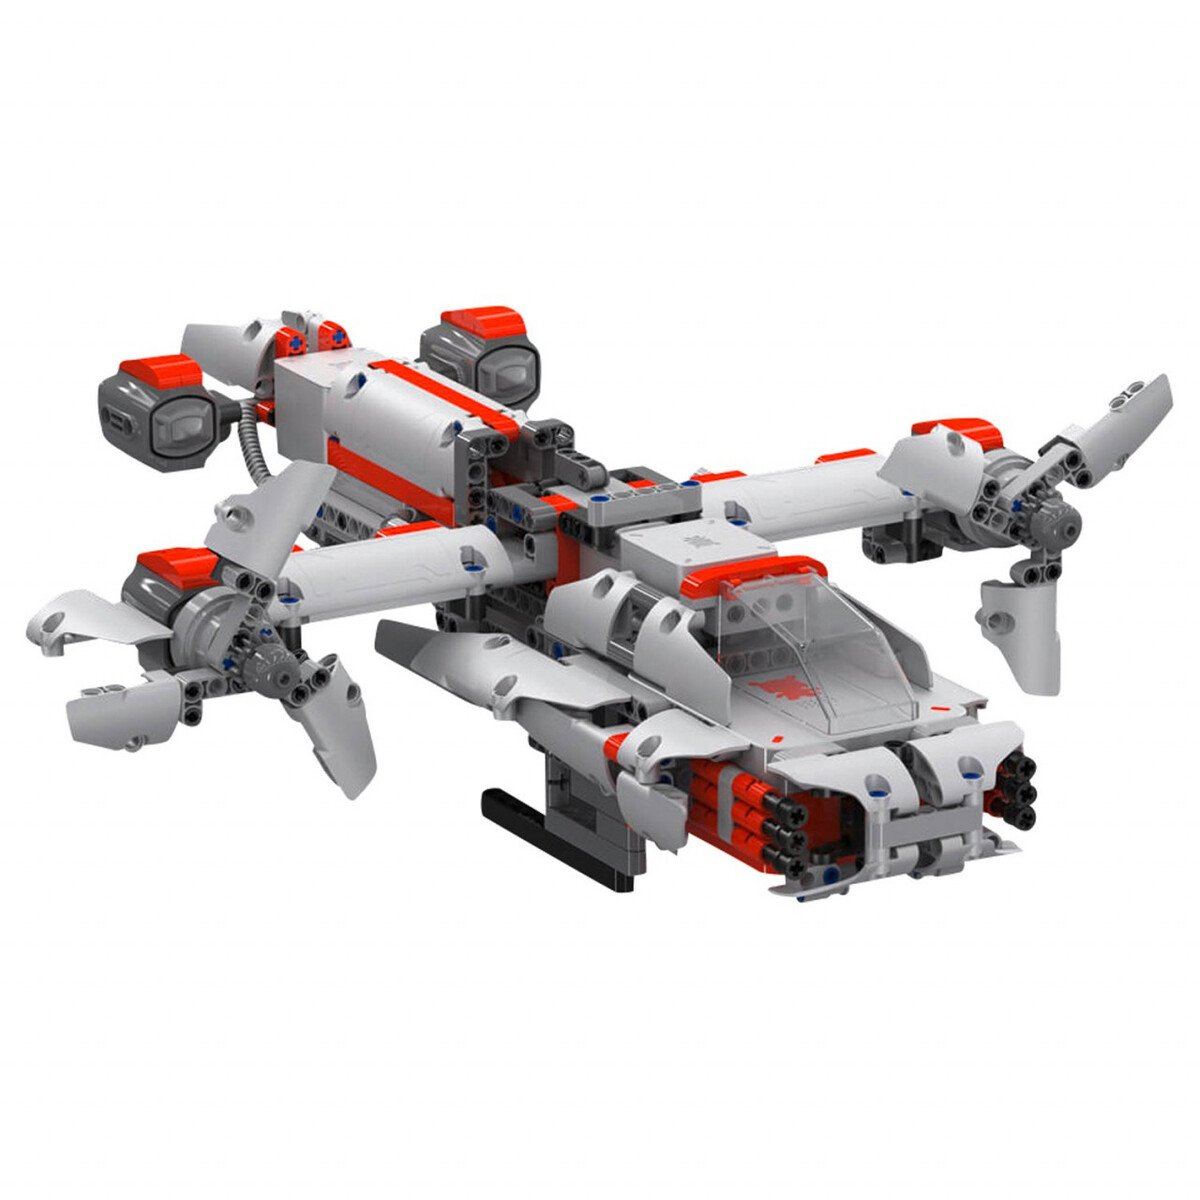 Bild 3 von Appgesteuerter Roboter Mi Robot Builder